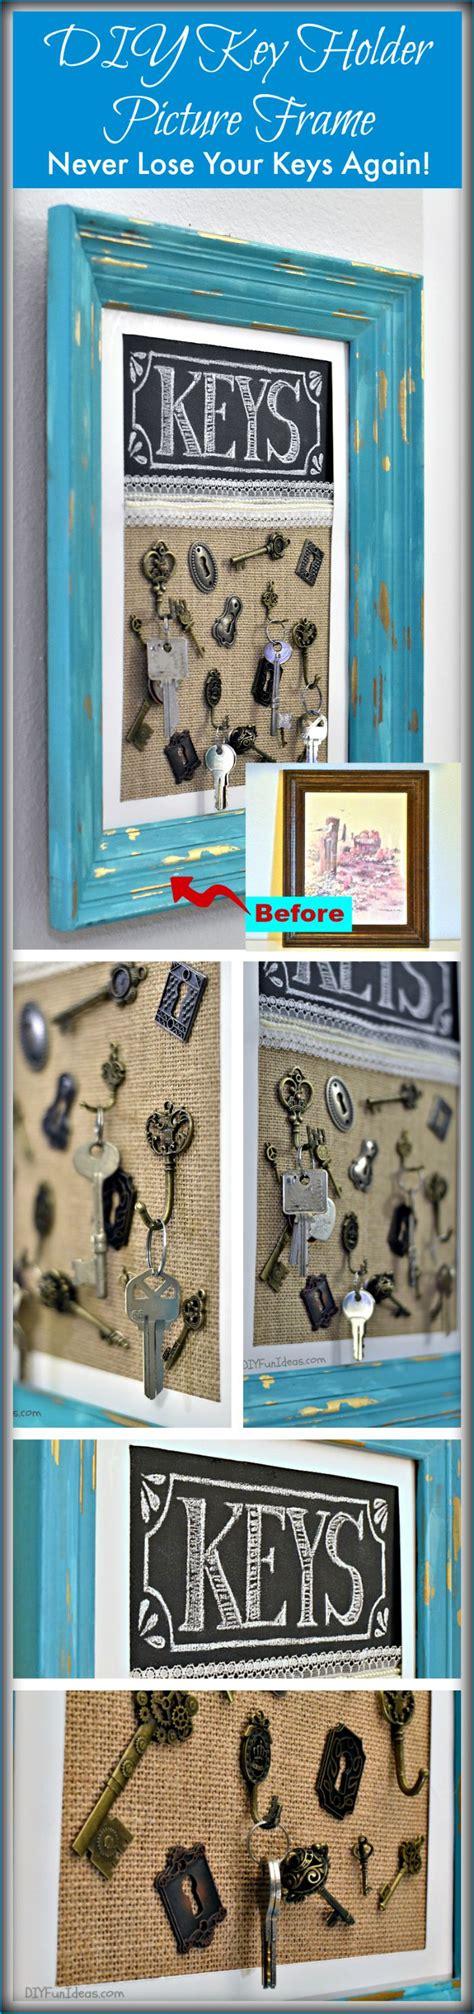 key organizer ideas solutions never misplace your keys diy key holder picture frame